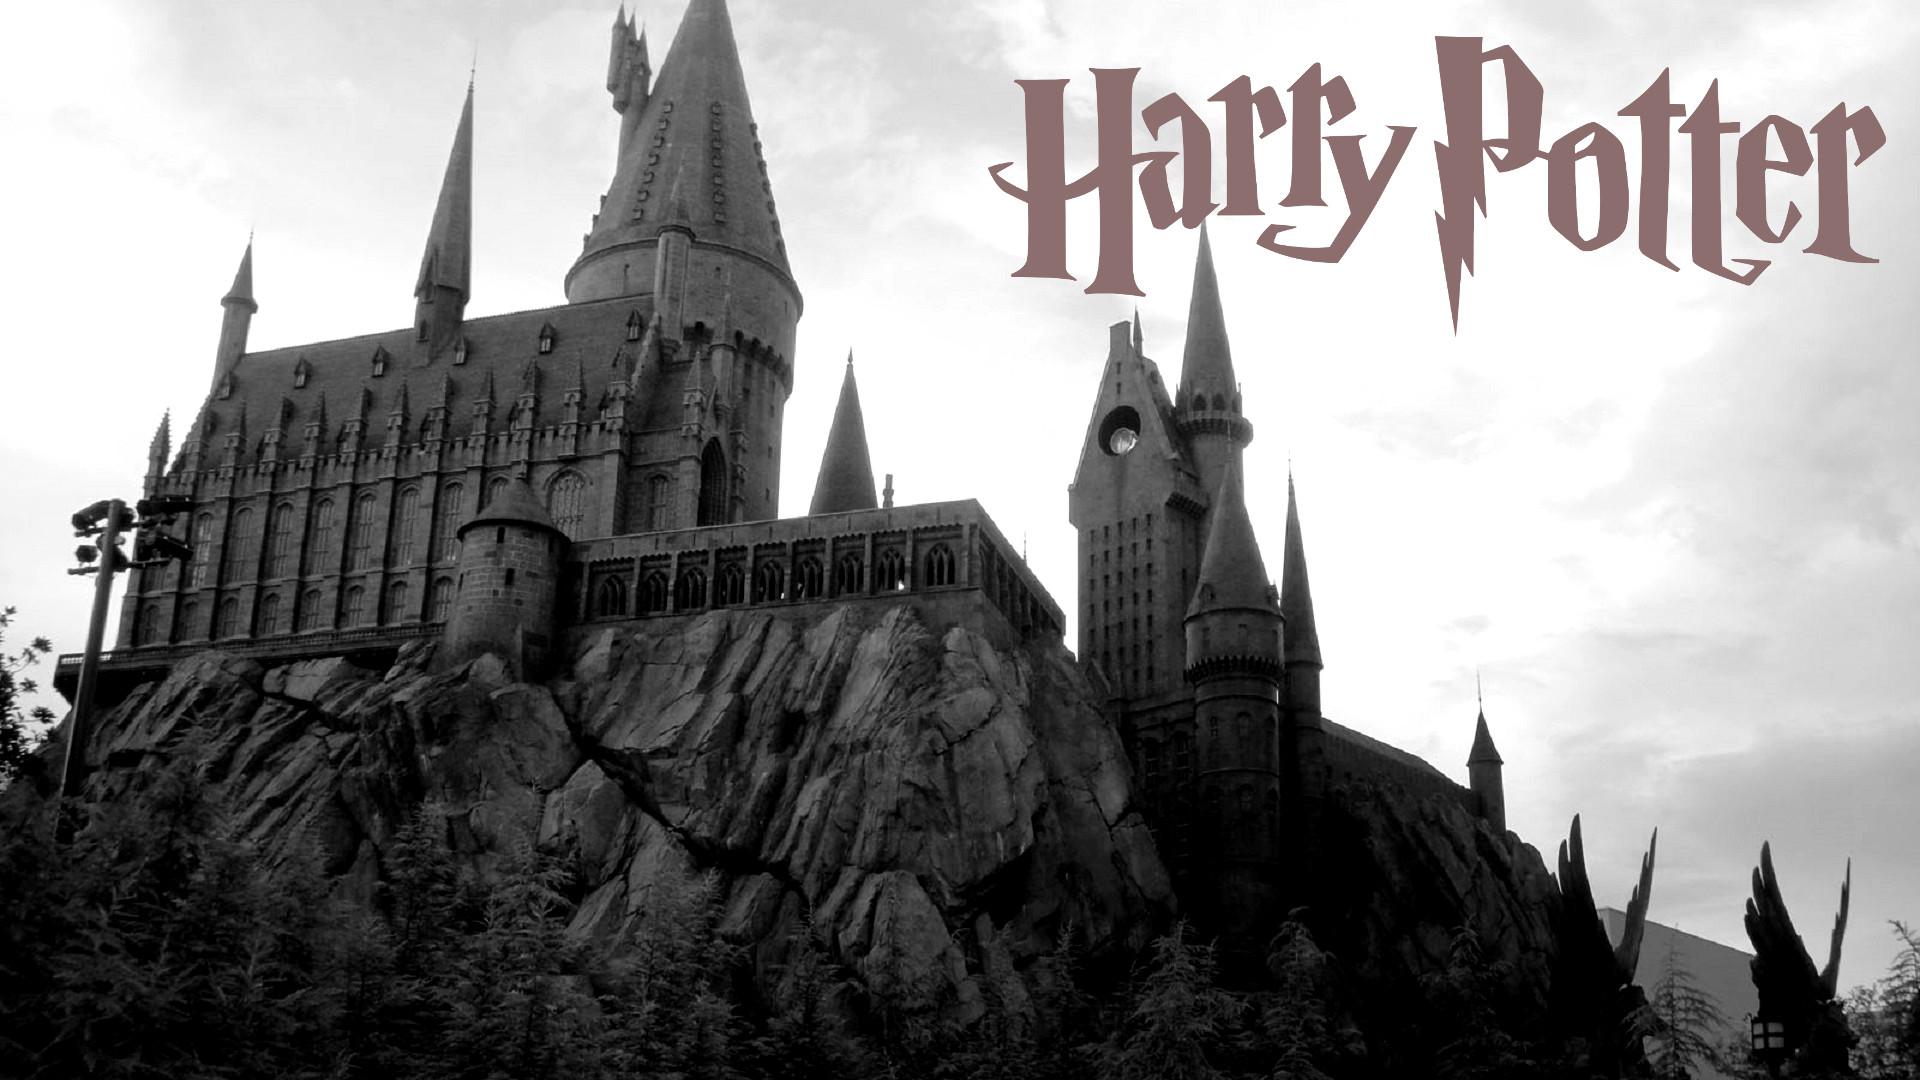 Harry Potter Desktop Wallpapers Page 1900×1200